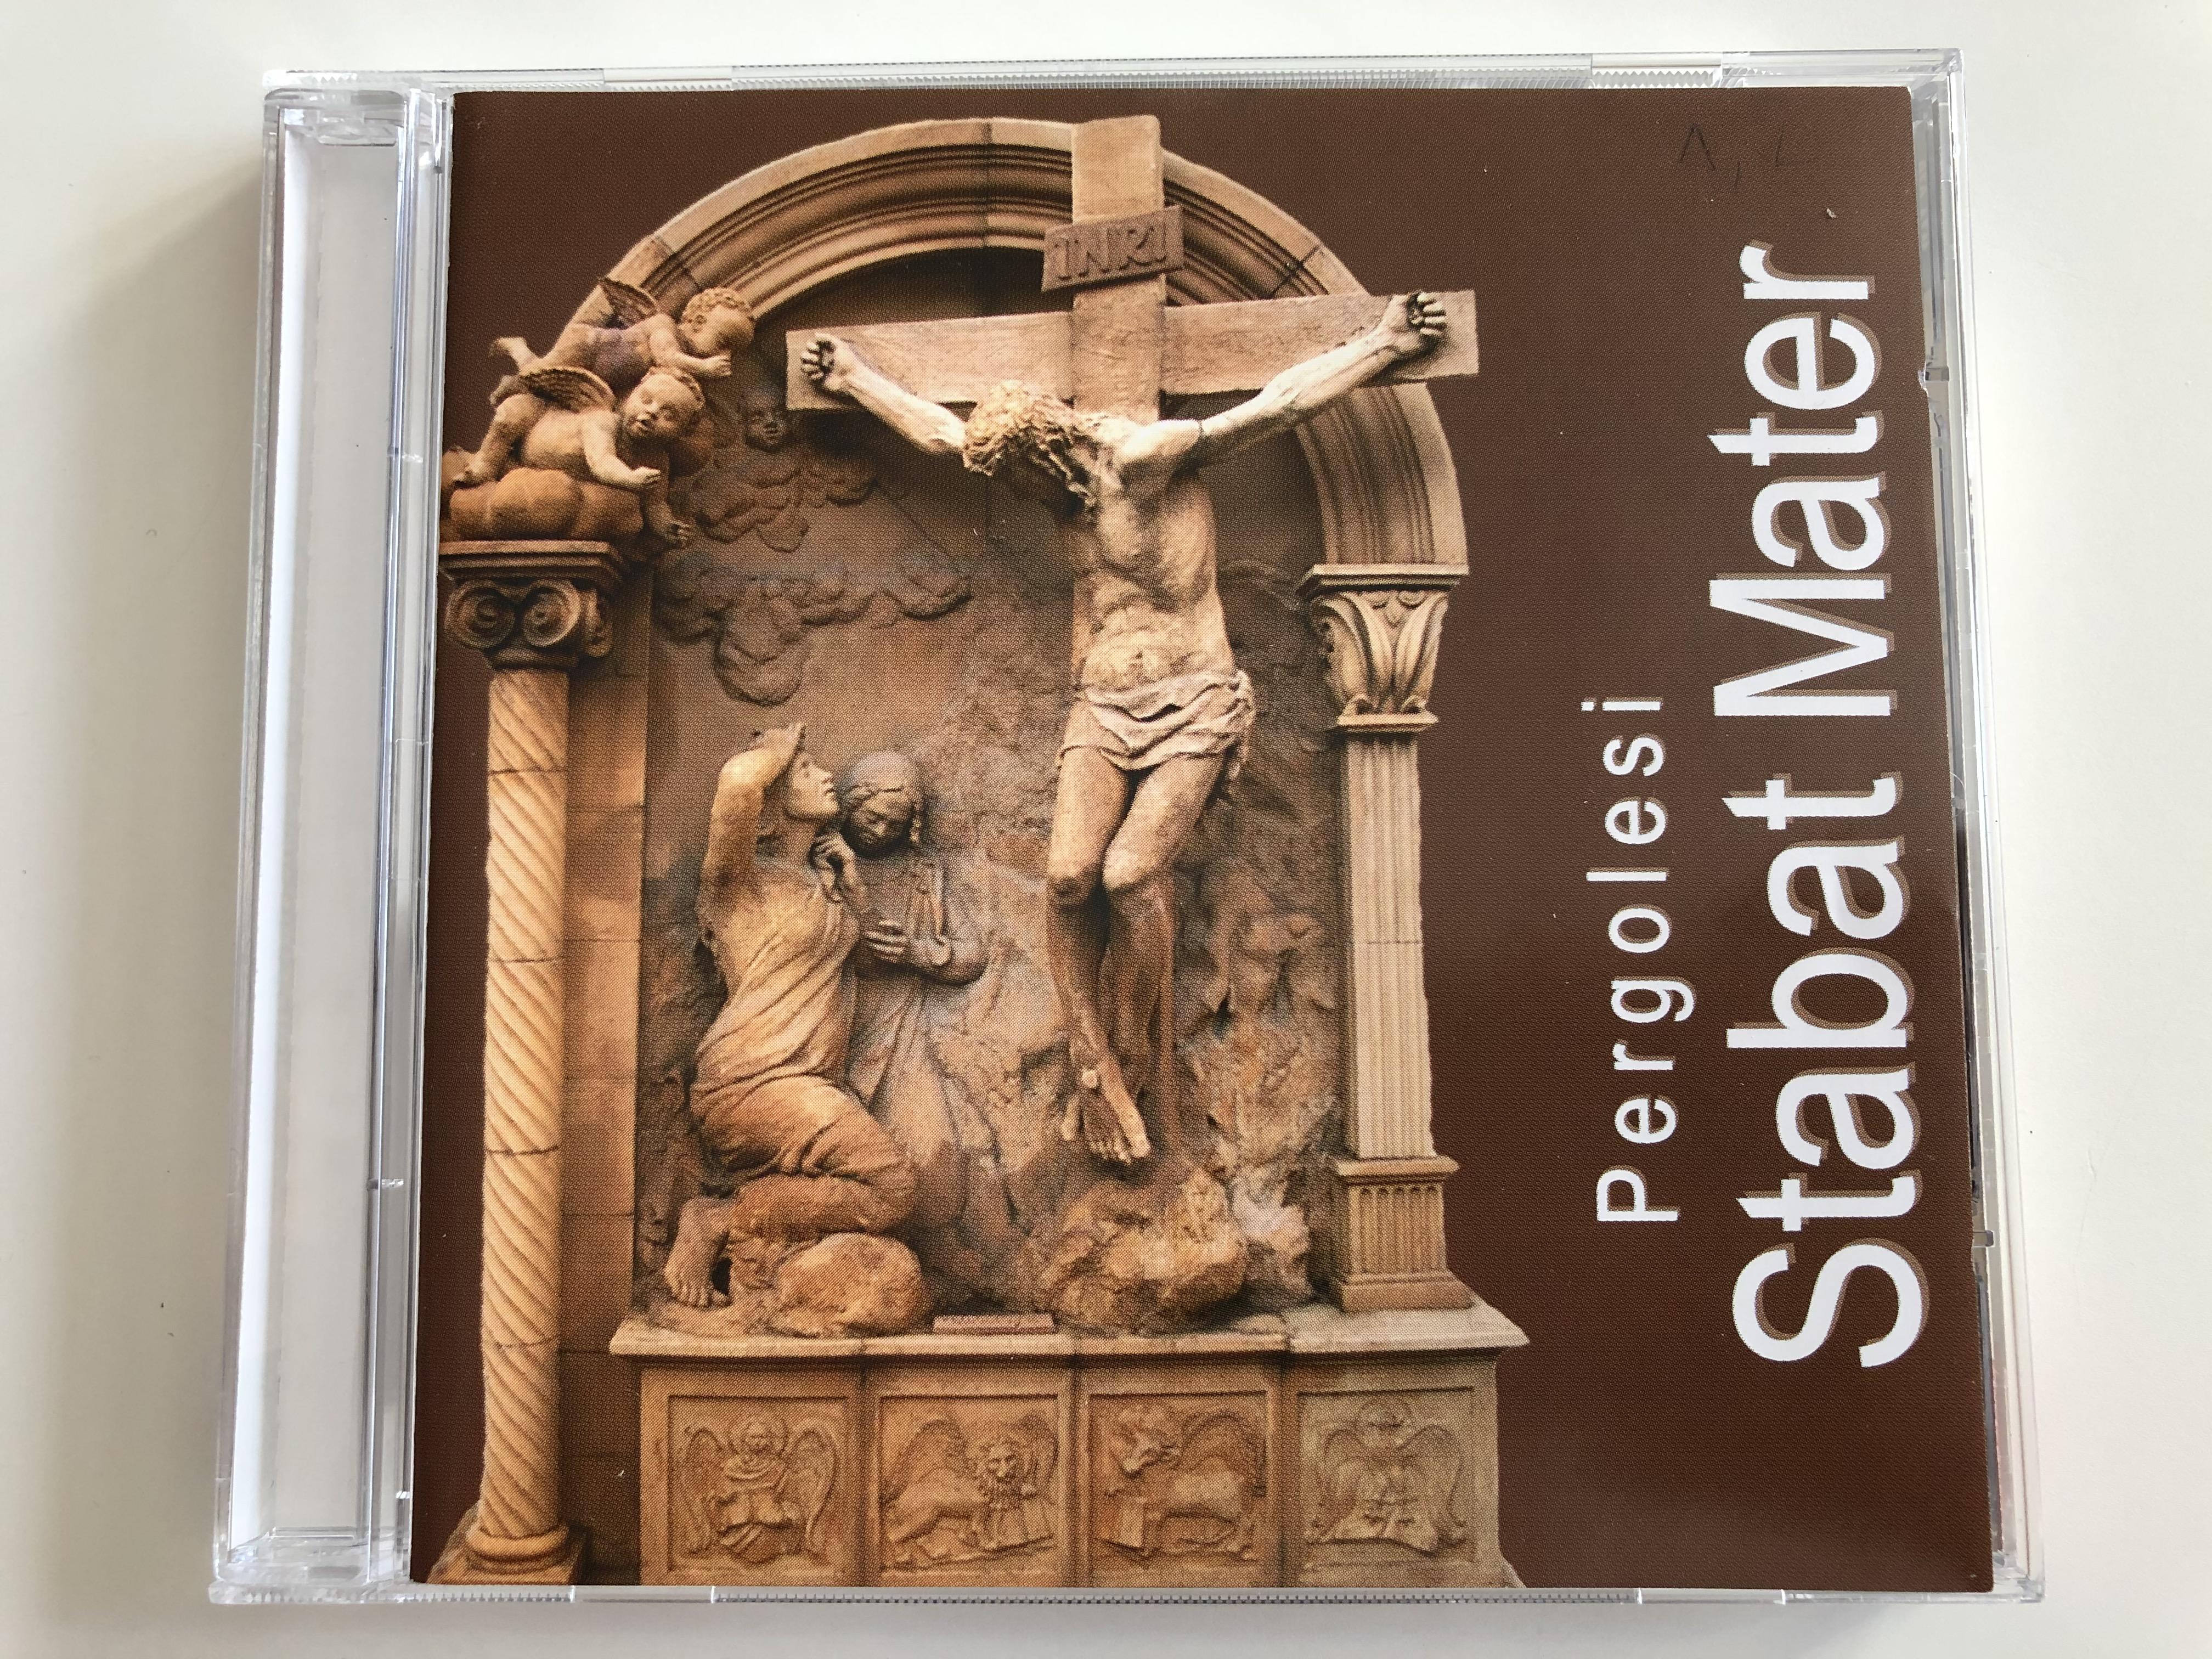 pergolesi-stabat-mater-allegro-thaler-audio-cd-2004-mza-070-1-.jpg